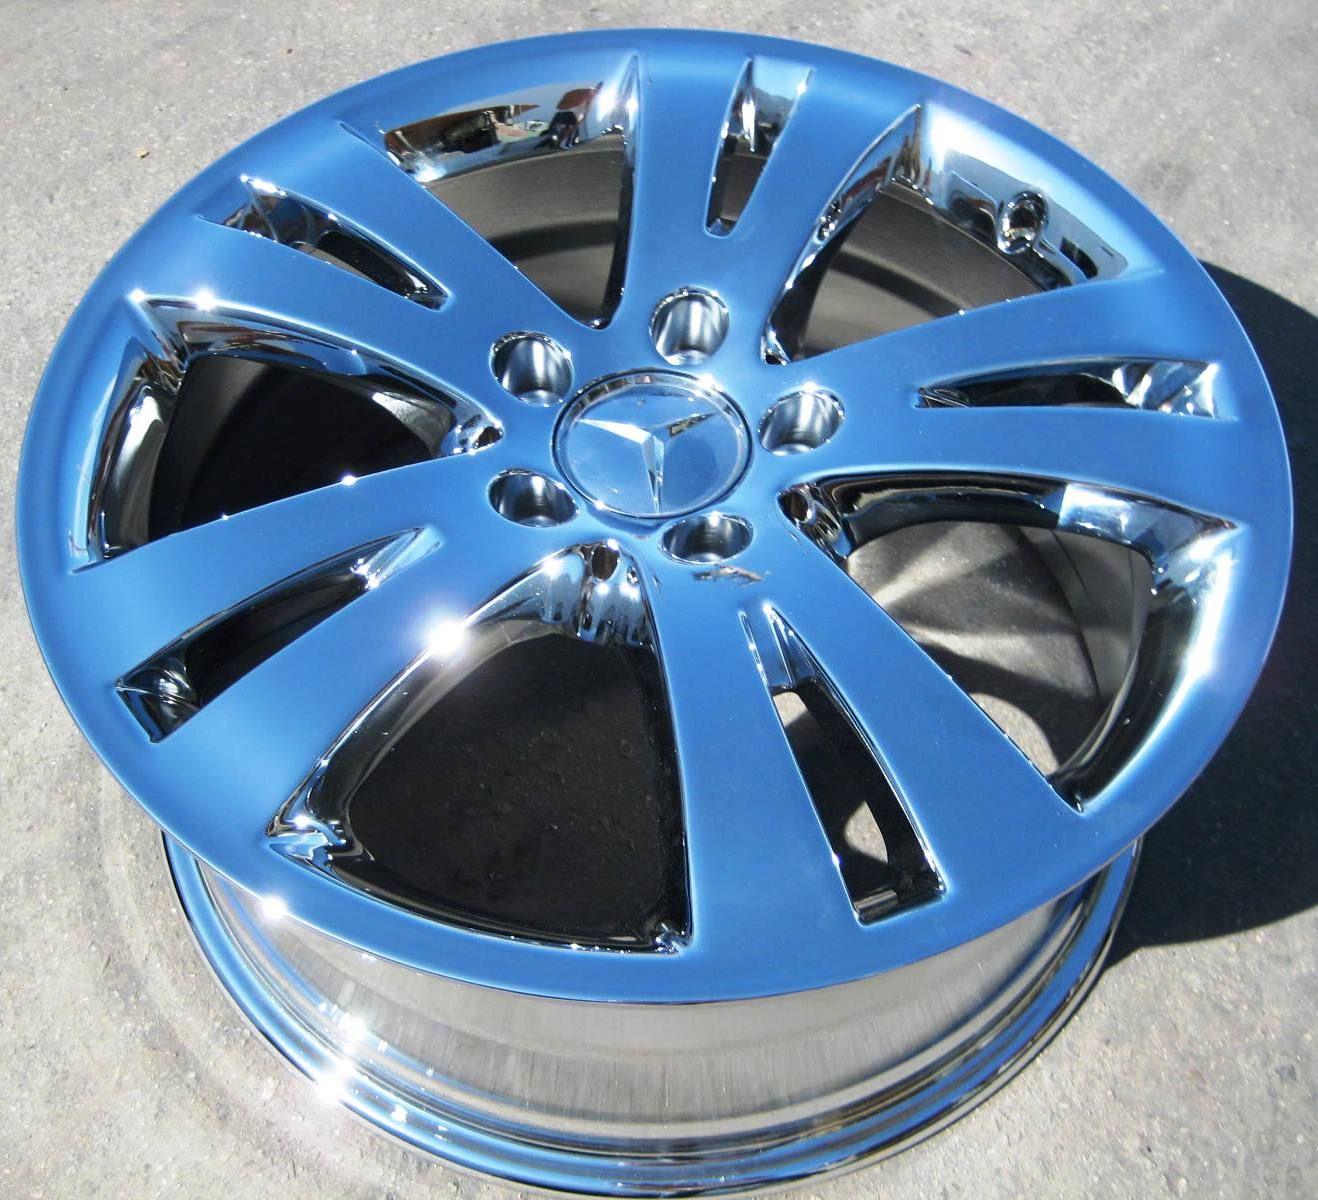 Mercedes C300 C350 E350 E550 Sedan Chrome Wheels Rims Set 4